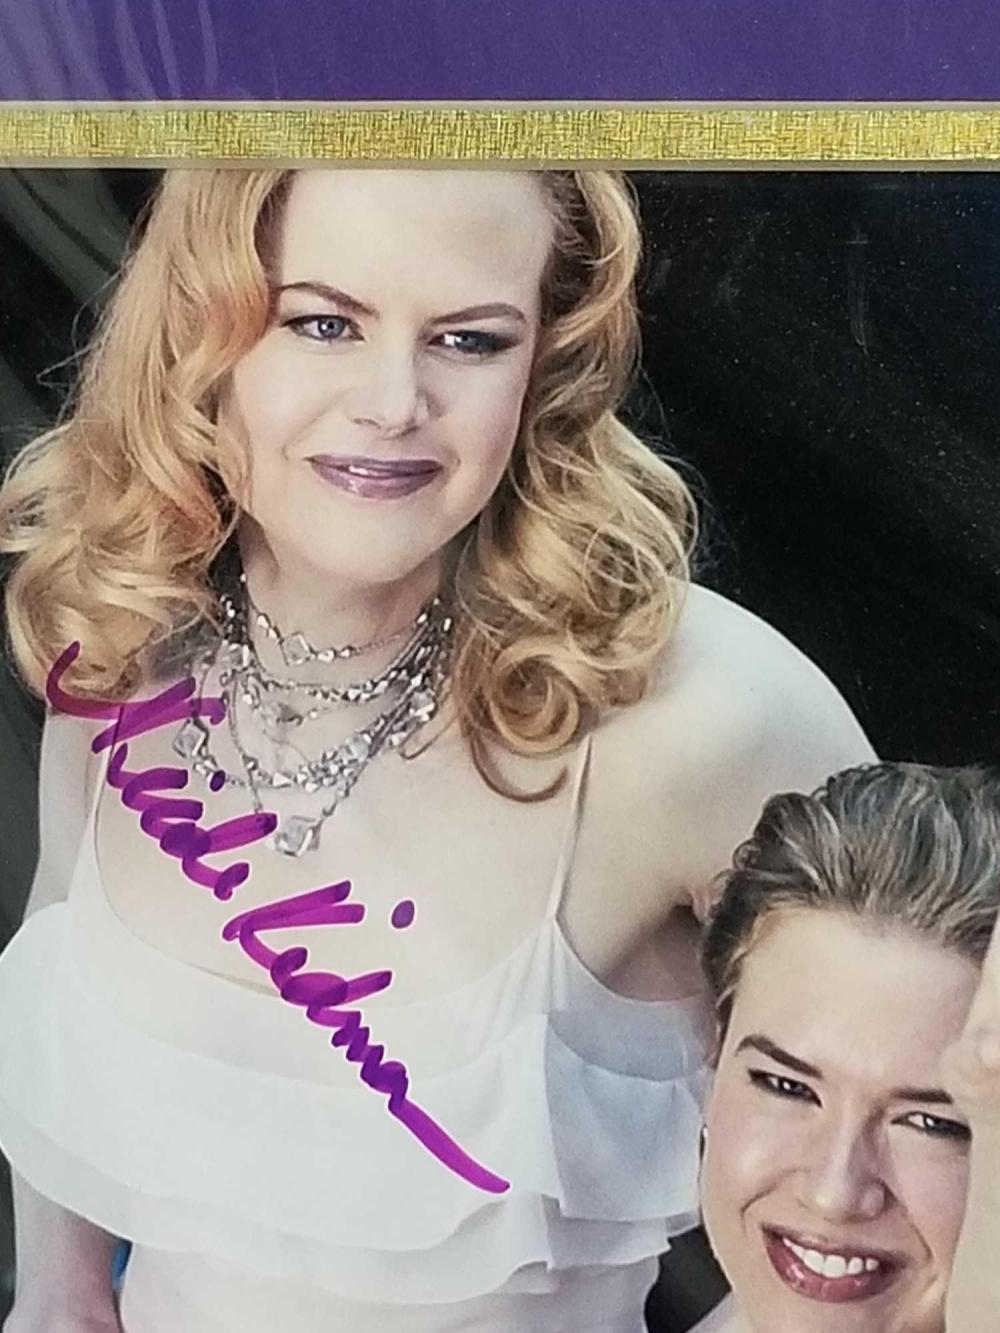 Lot 127: NICOLE KIDMAN & RENEE ZELLWEGER DOUBLE SIGNED COLOR EVENT PHOTO W/ LETTER OF GUARANTEE